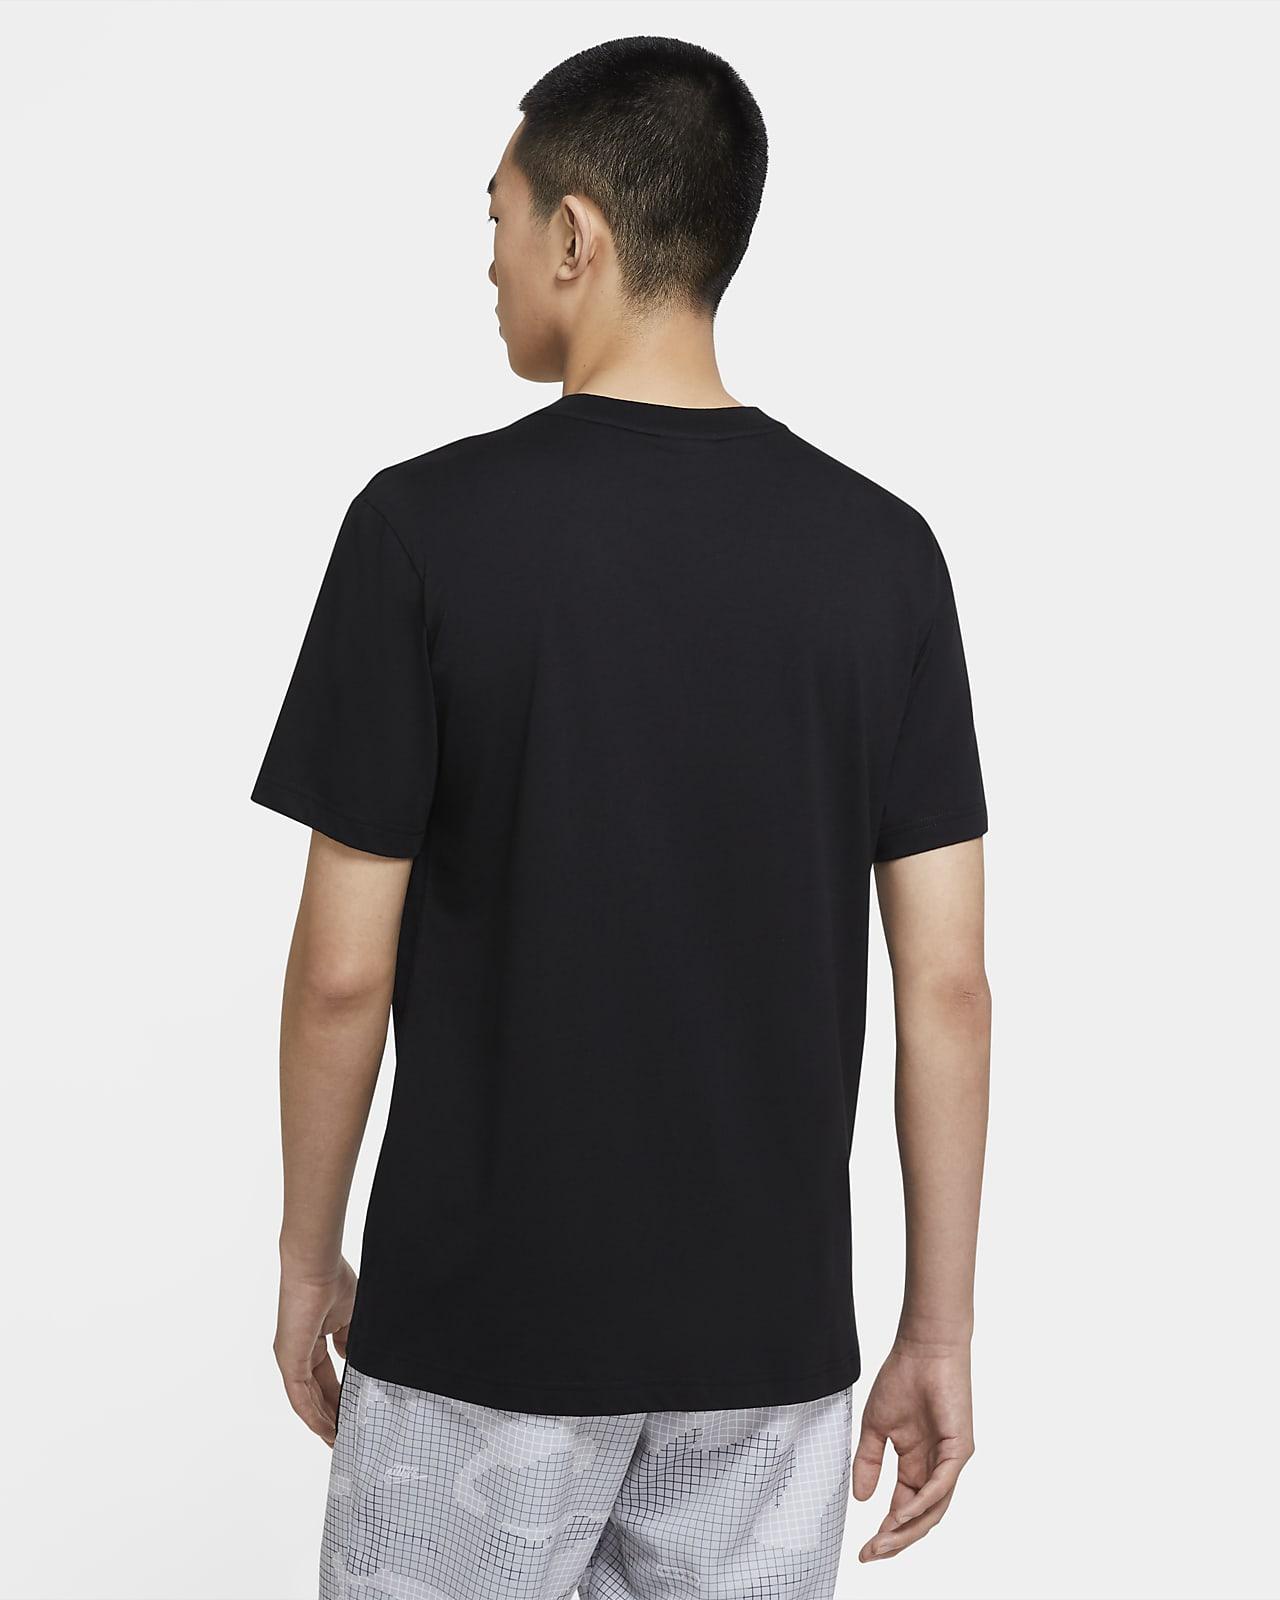 Inevitable Deportista dueño  Nike Sportswear Camiseta Air Max - Hombre. Nike ES